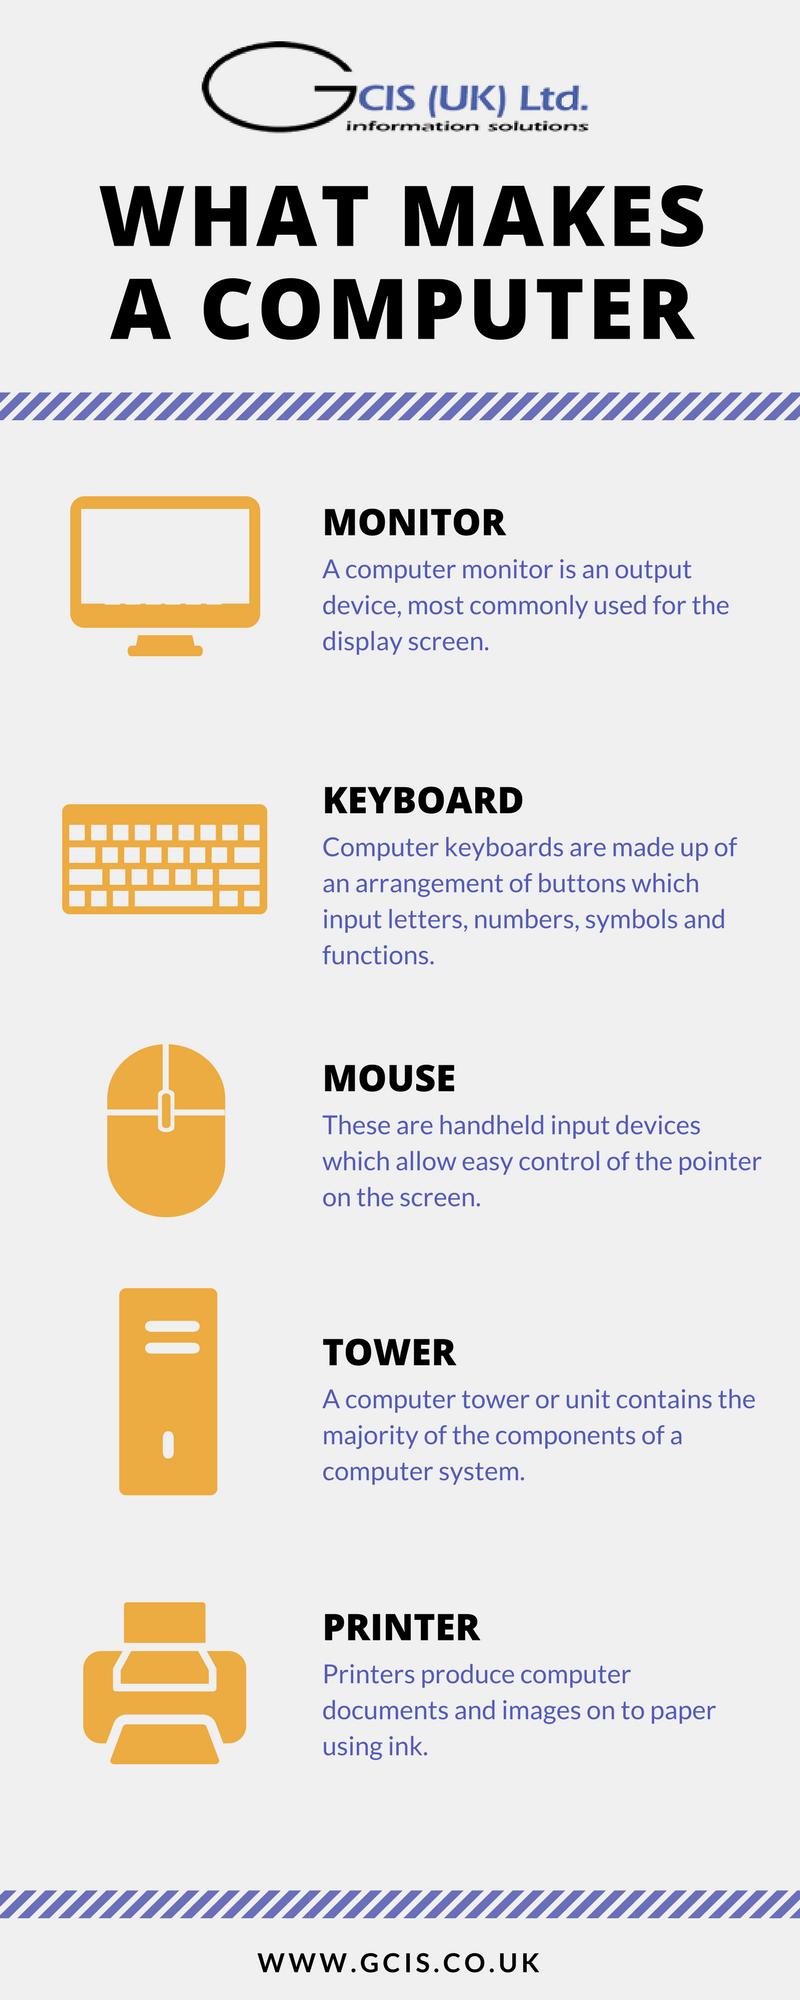 what-makes-computer-infographic-lkrllc